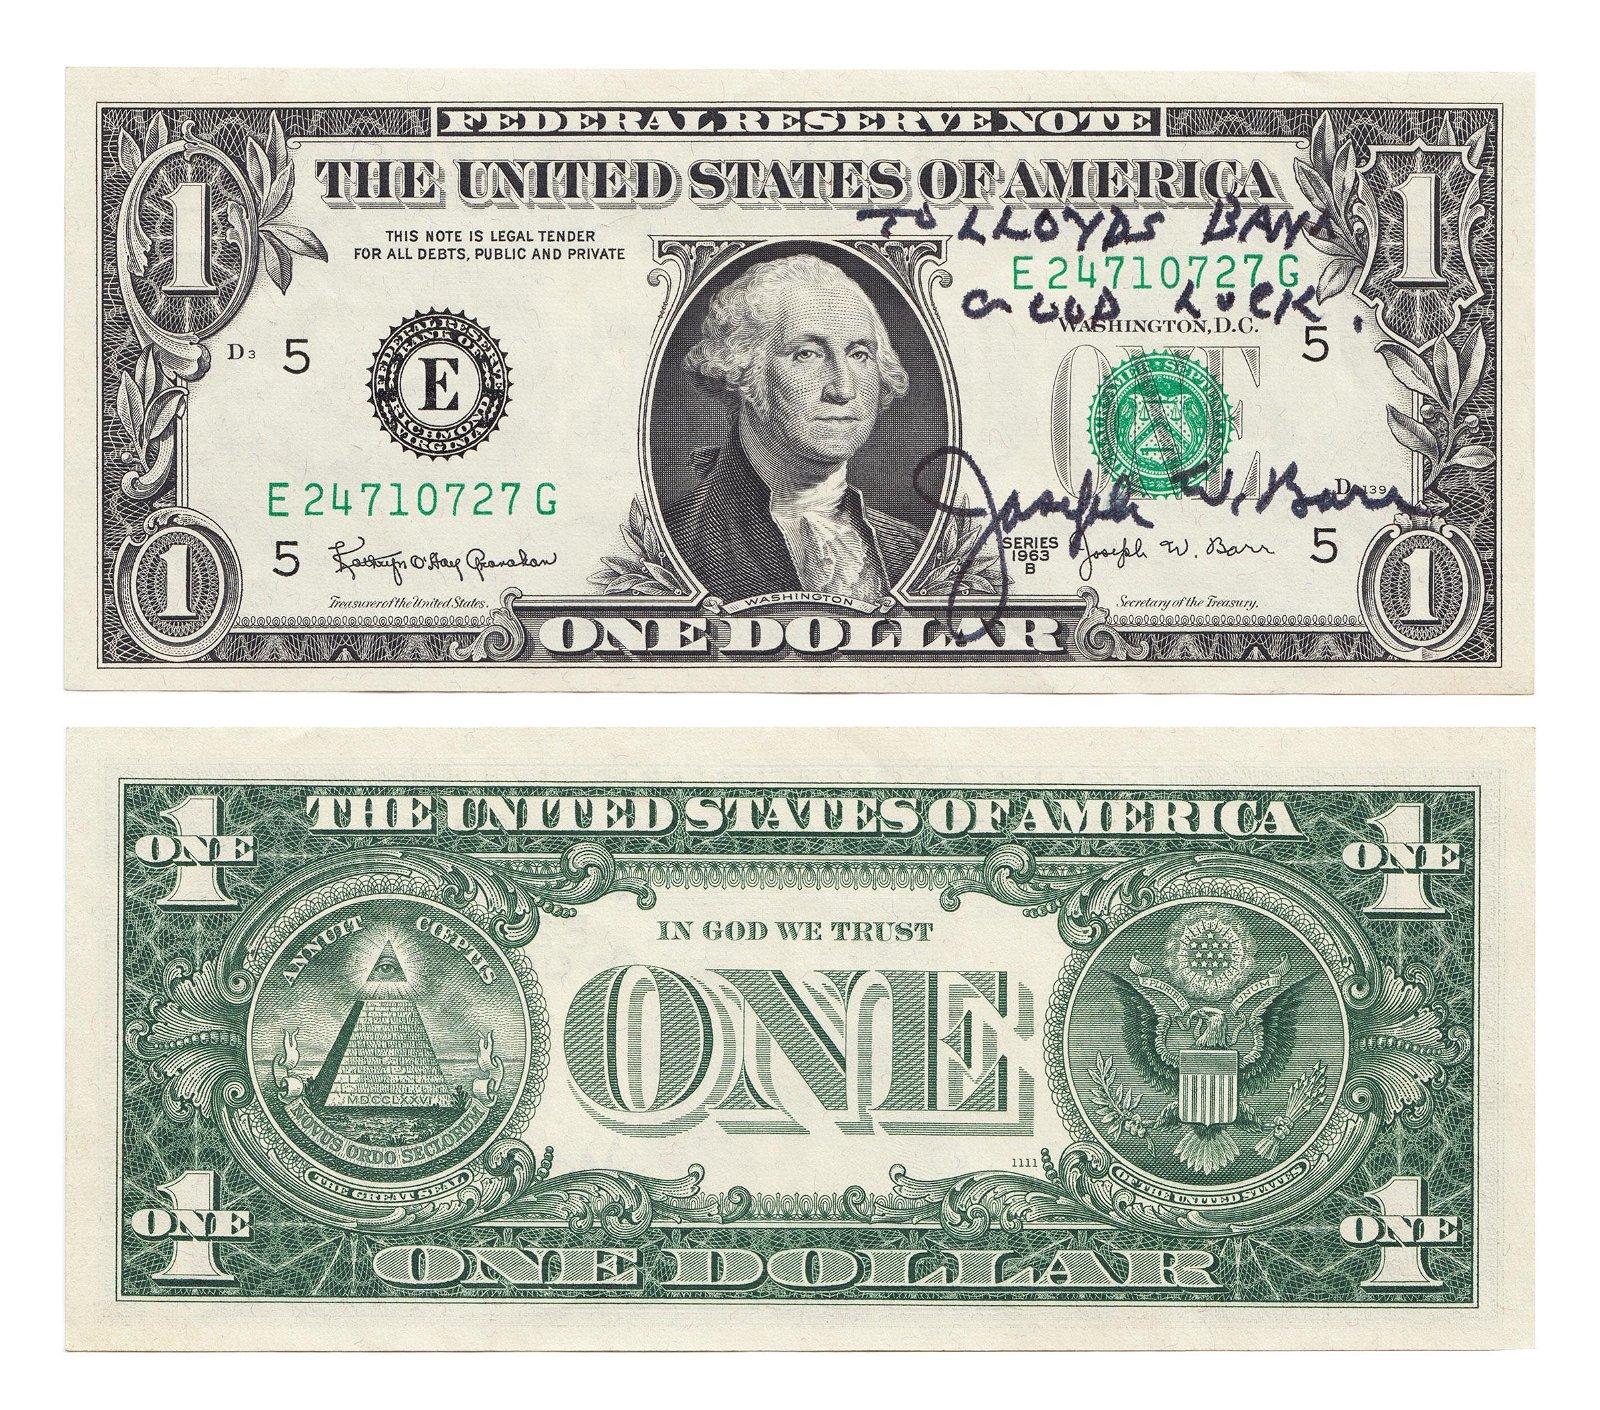 USA - J W Barr - 'To Lloyds Bank Good Luck' Dollar Note